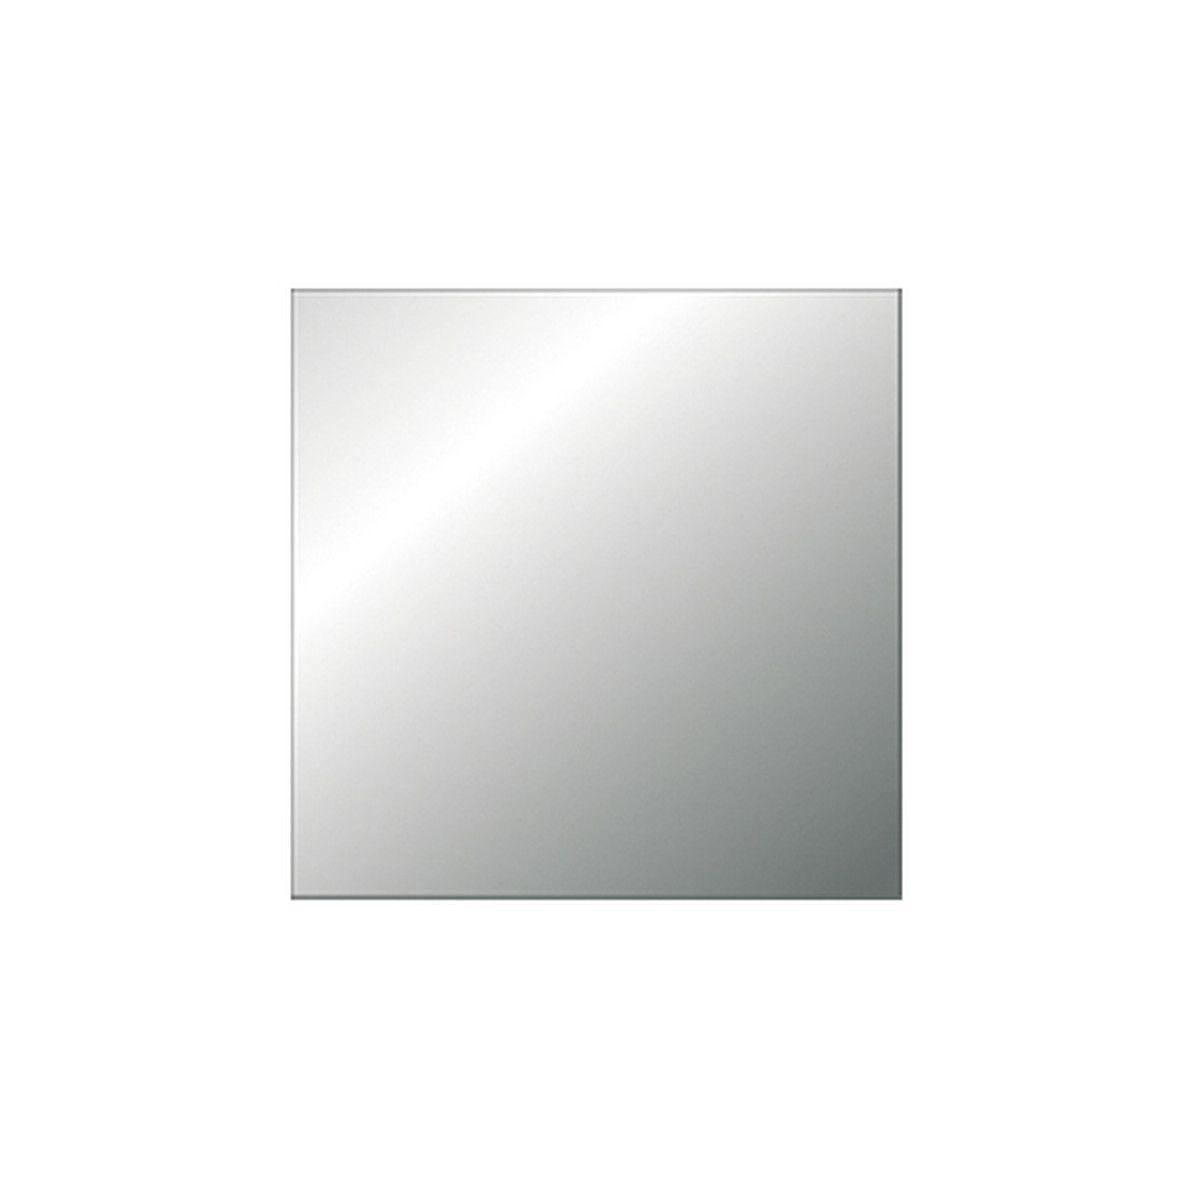 Driade No Frame I Quadratischer Wandspiegel Spiegelglas